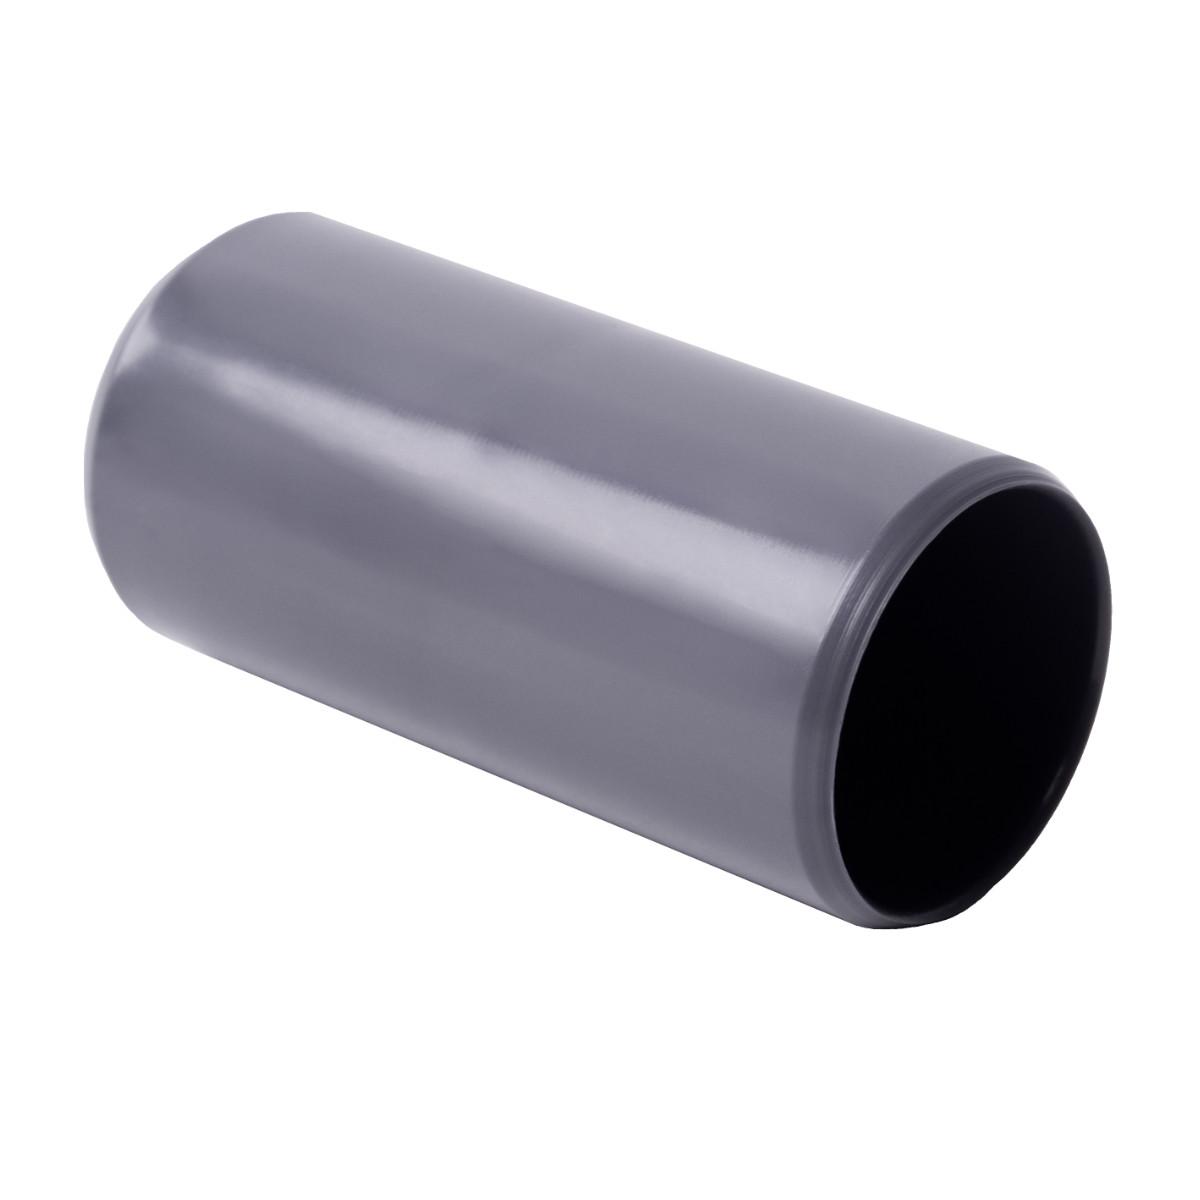 0240_LB Муфта для EN труб